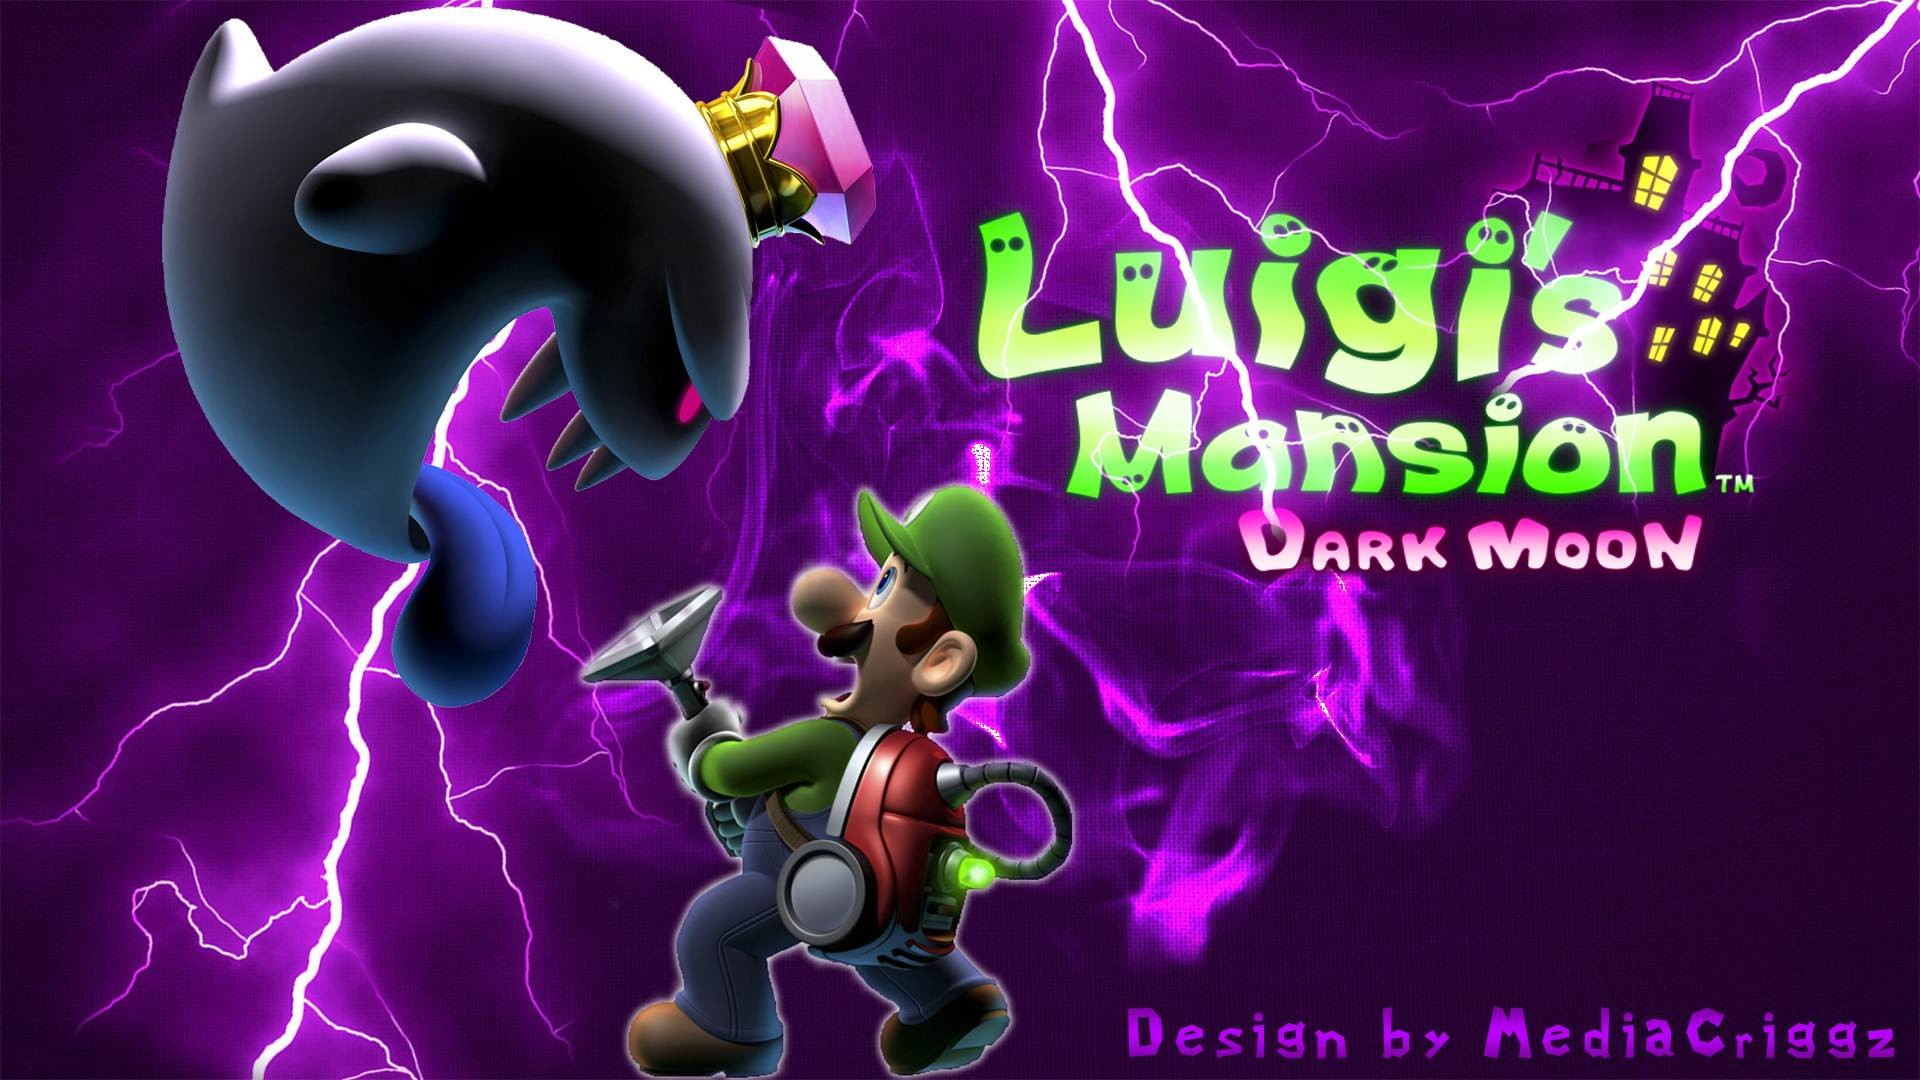 Luigi's Mansion Dark Moon wallpaper   Max   Pinterest   Dark moon and Video  games